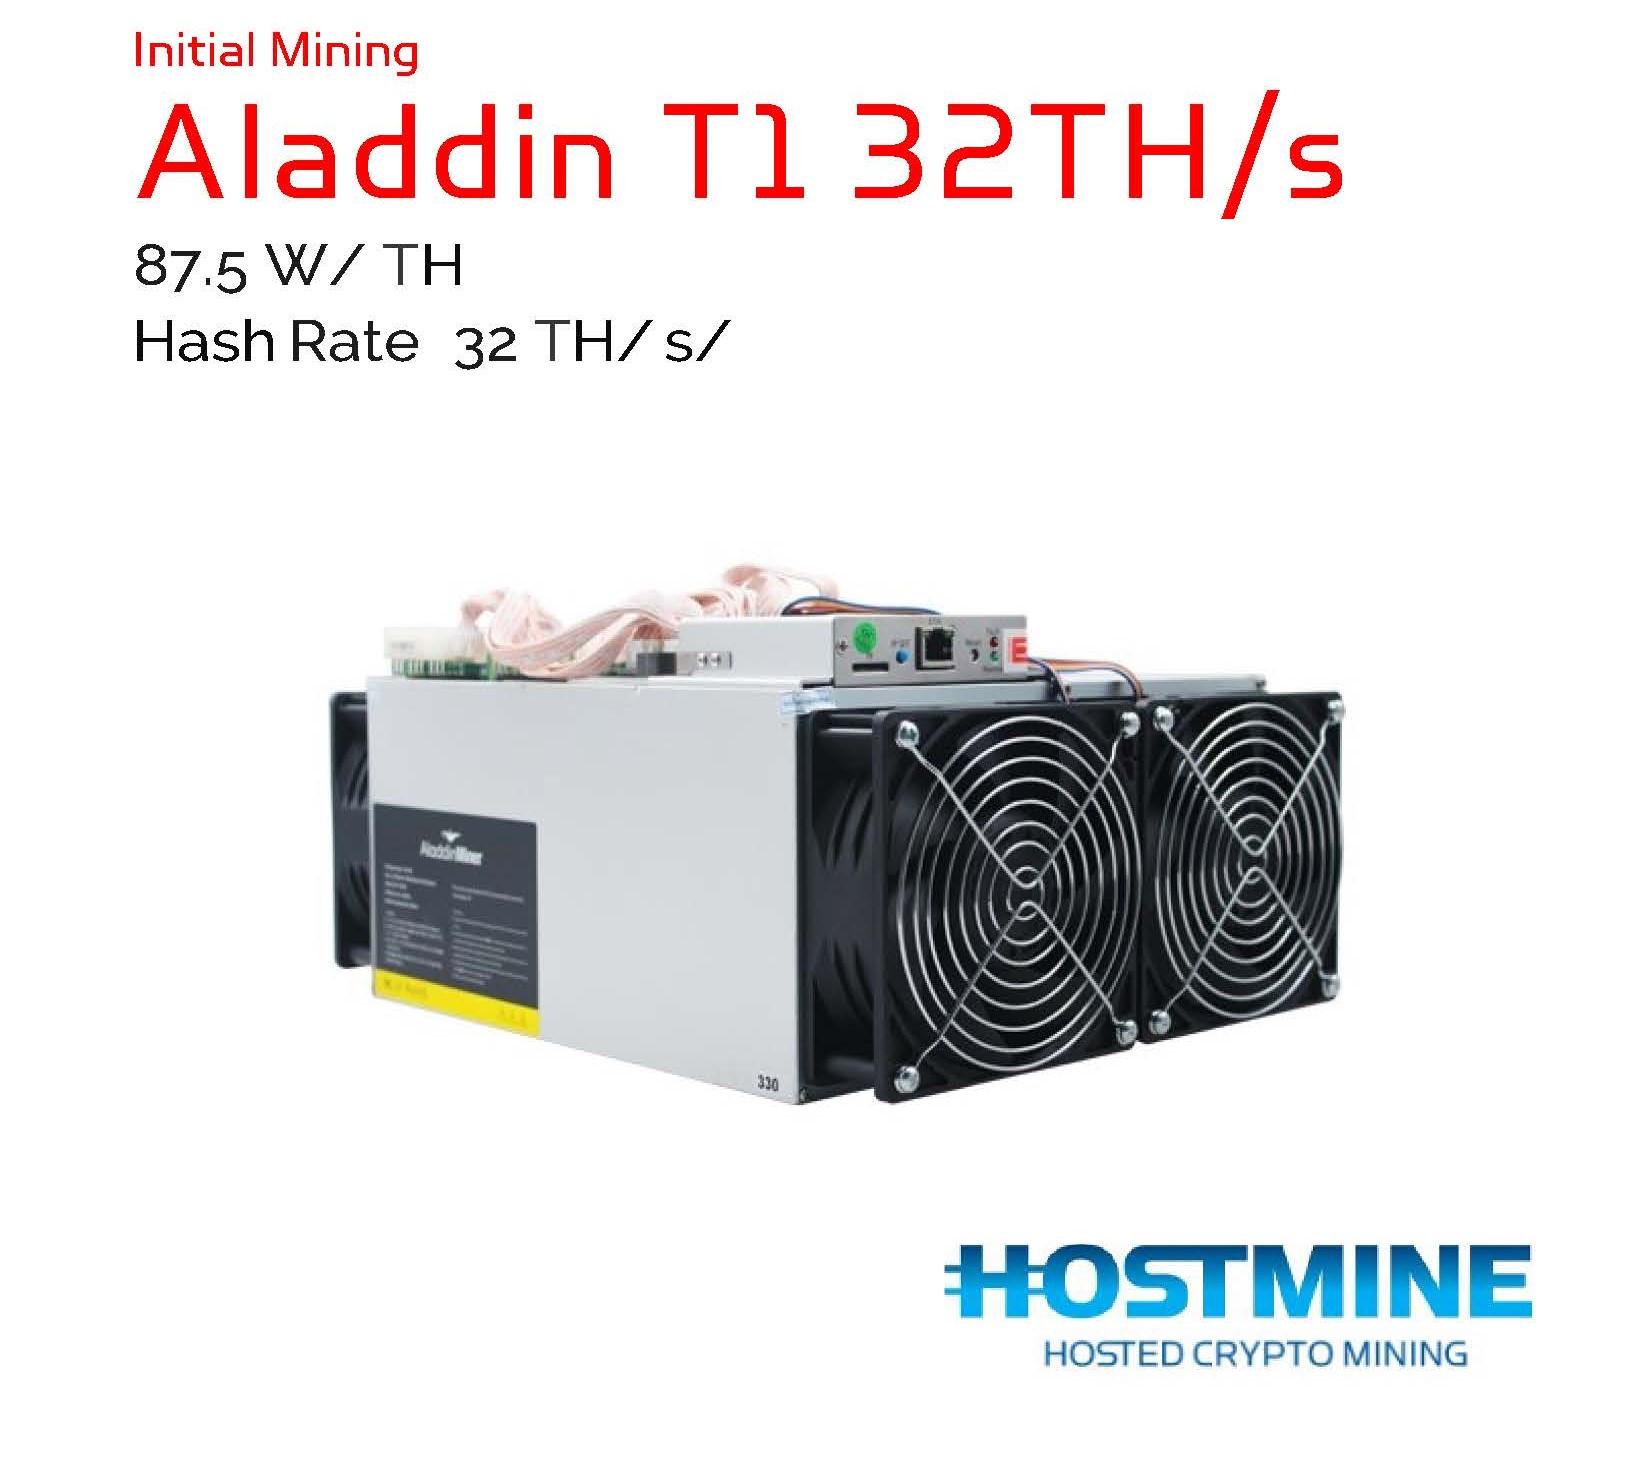 Aladdin T1 32TH/s | Hostmine